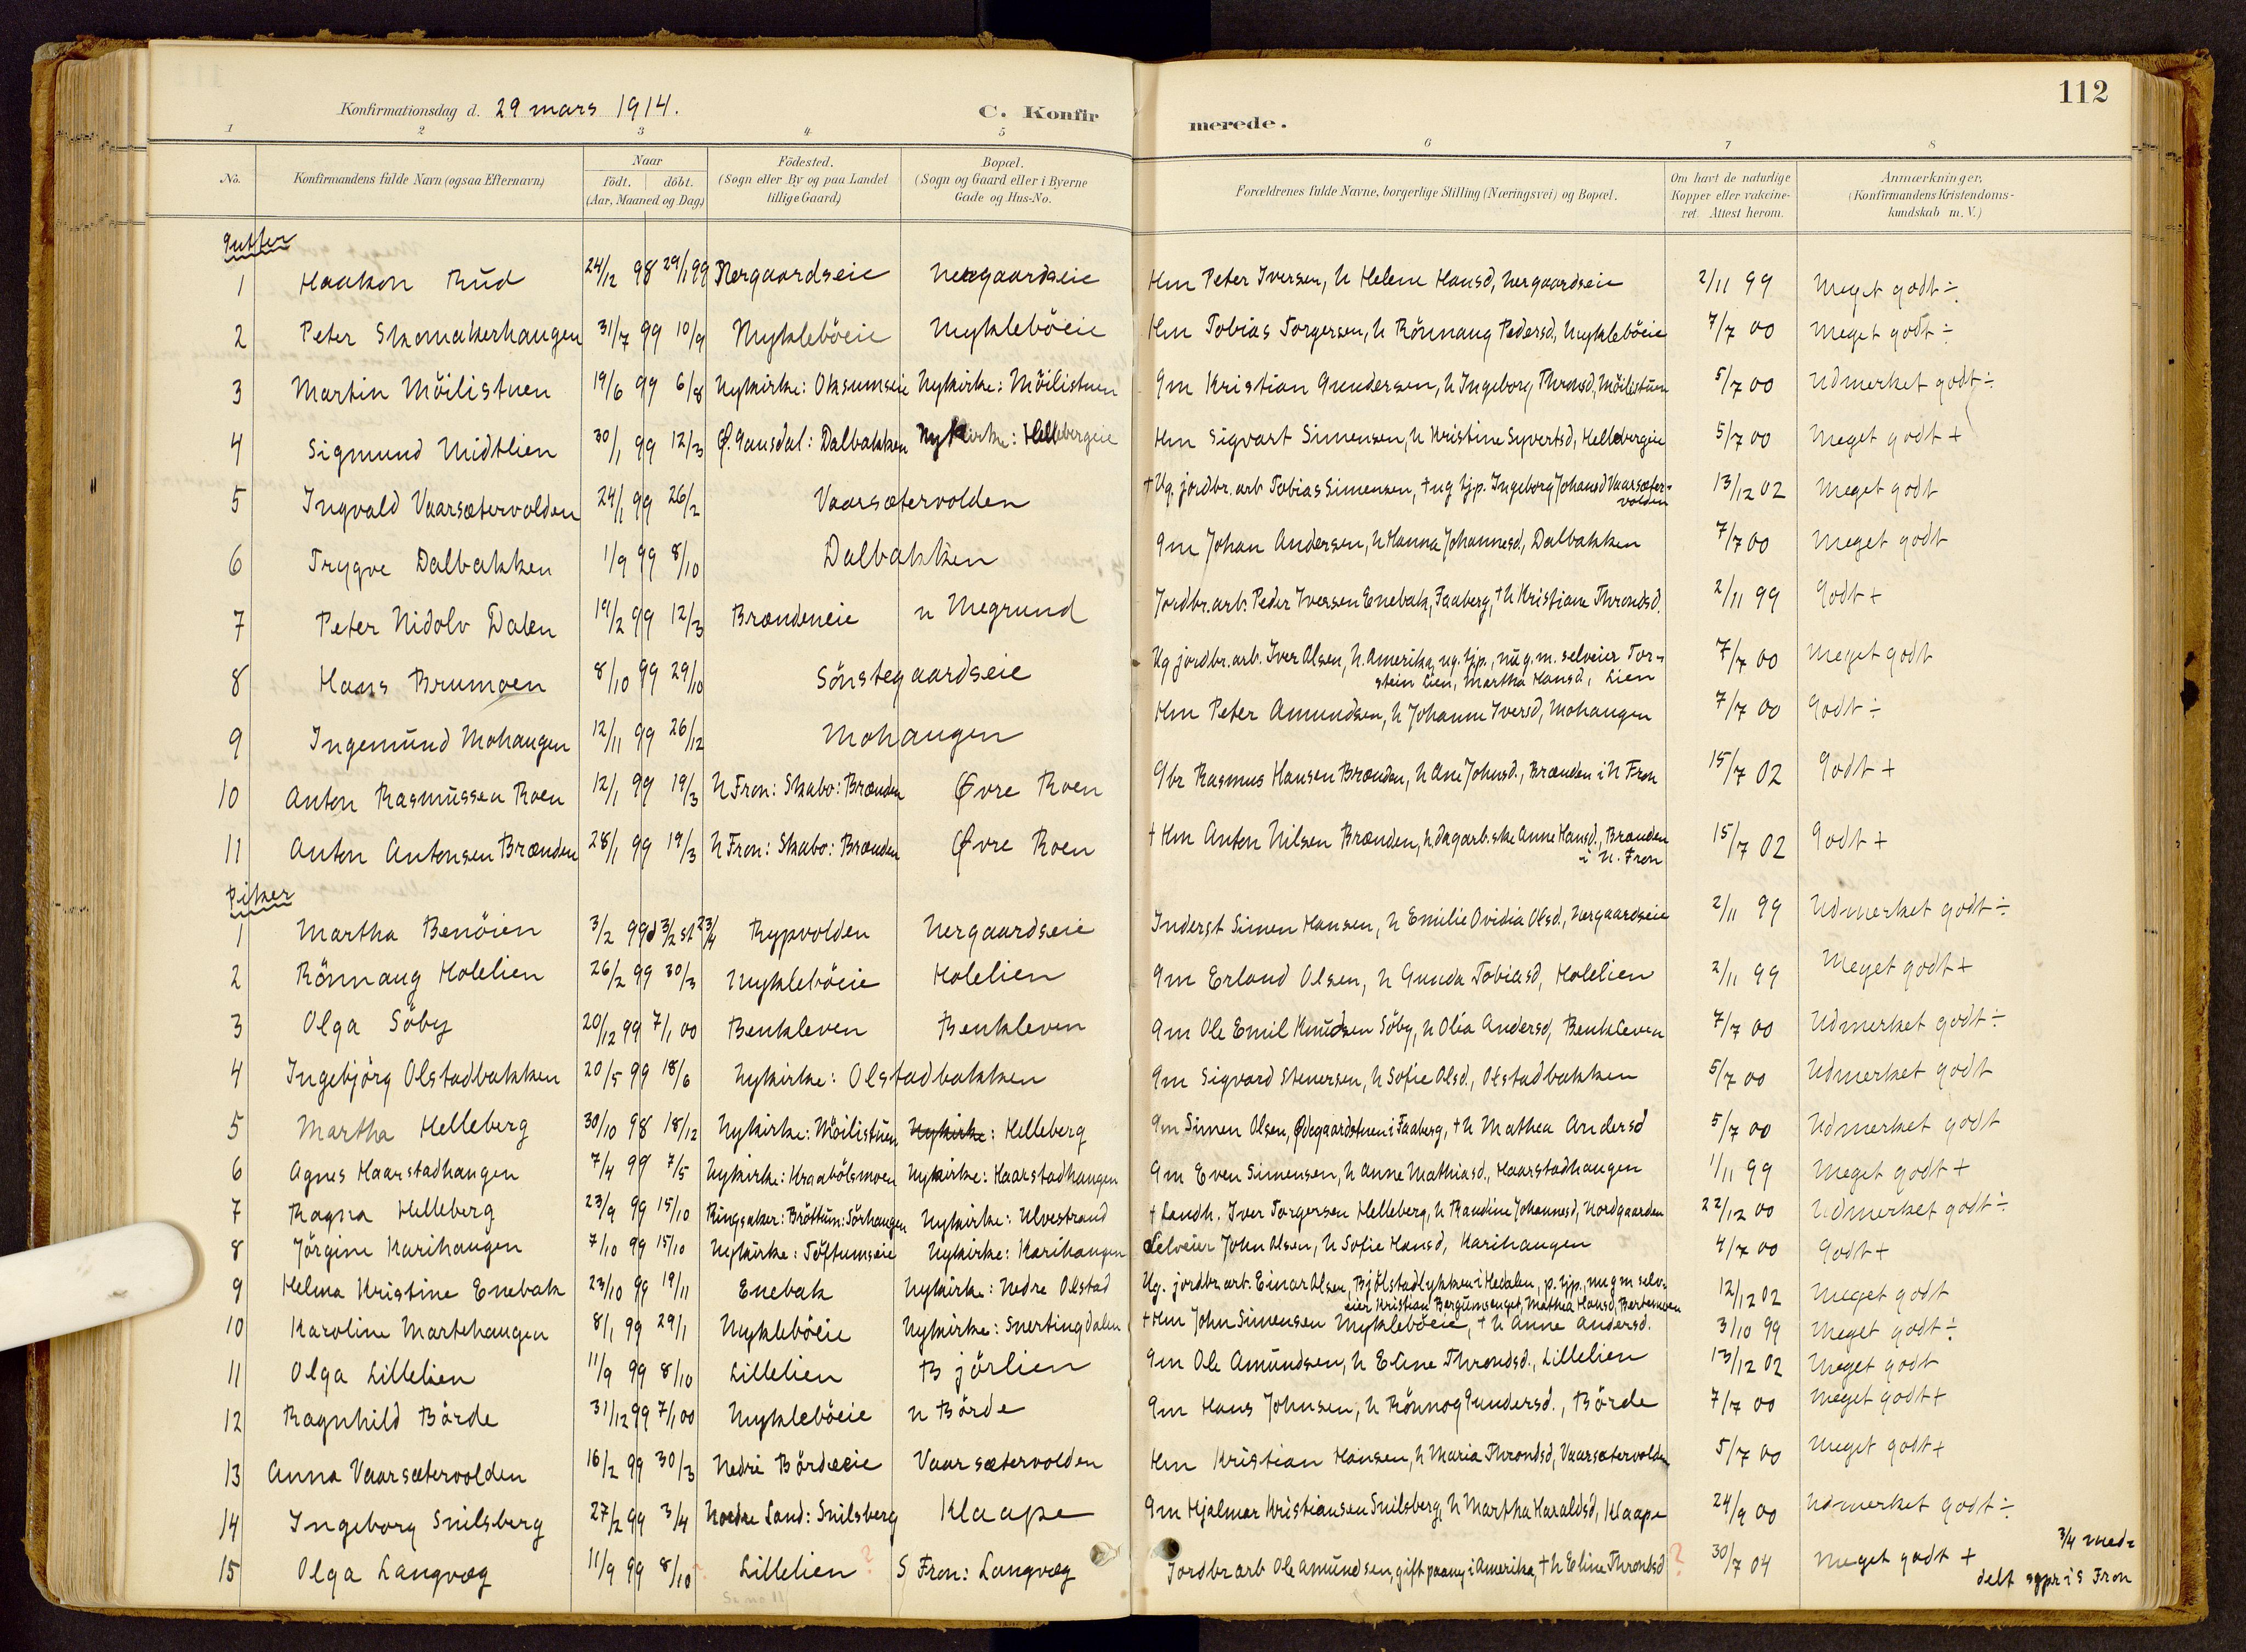 SAH, Vestre Gausdal prestekontor, Ministerialbok nr. 2, 1887-1918, s. 112